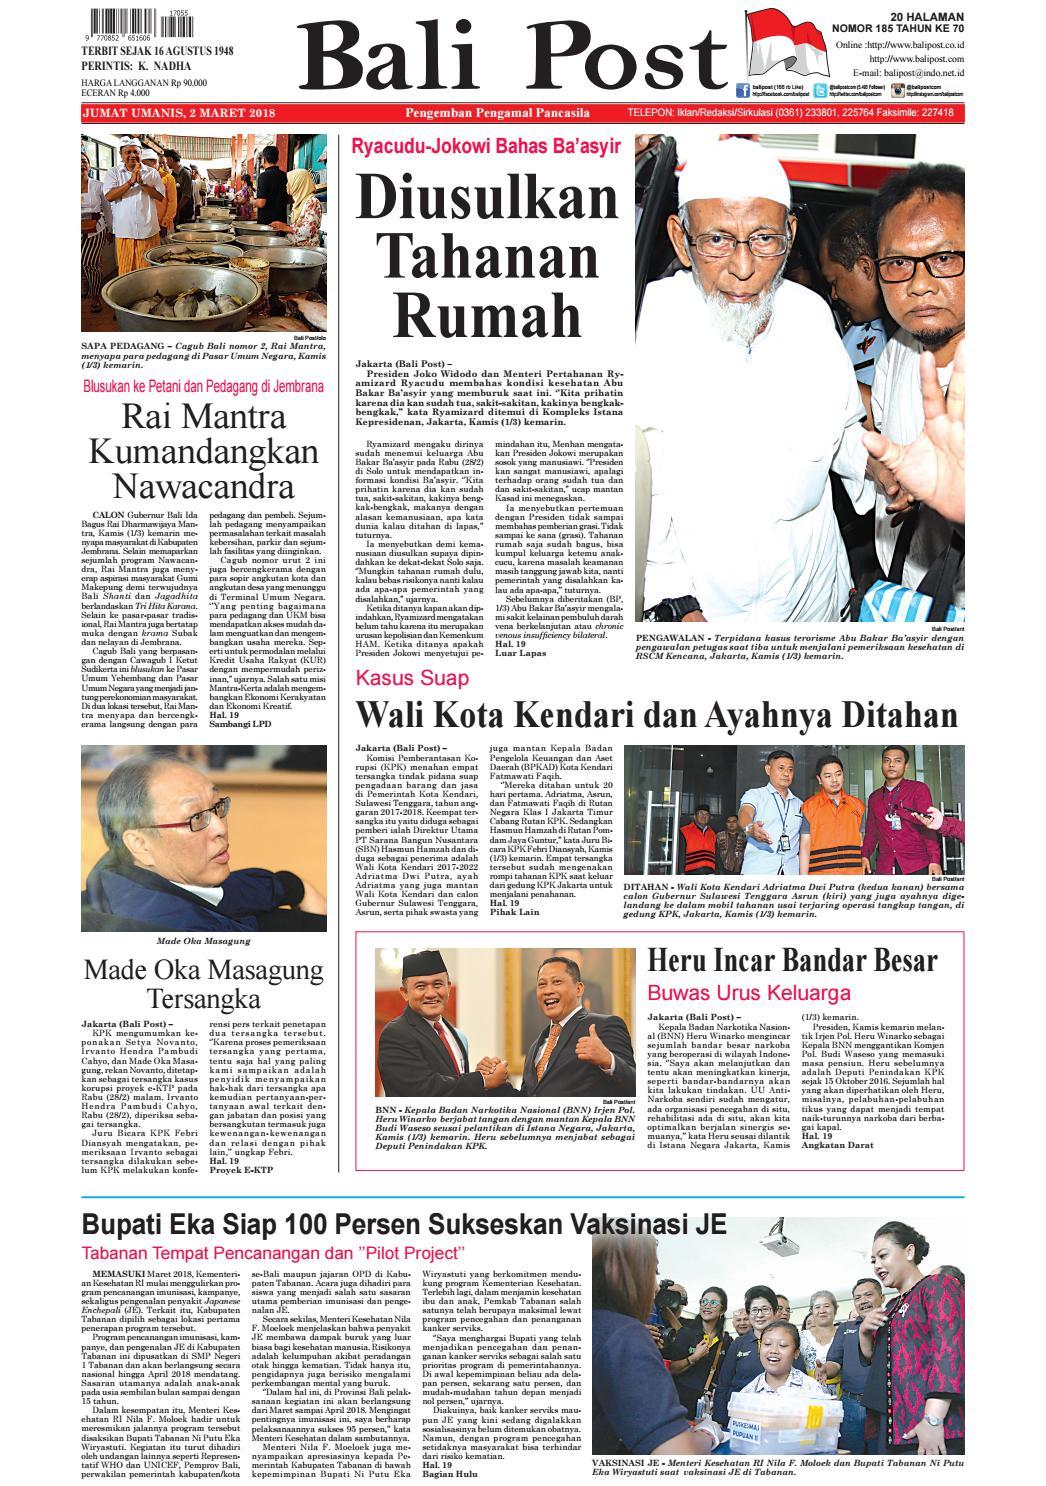 Edisi 02 Maret 2019 Balipostcom By E Paper KMB Issuu